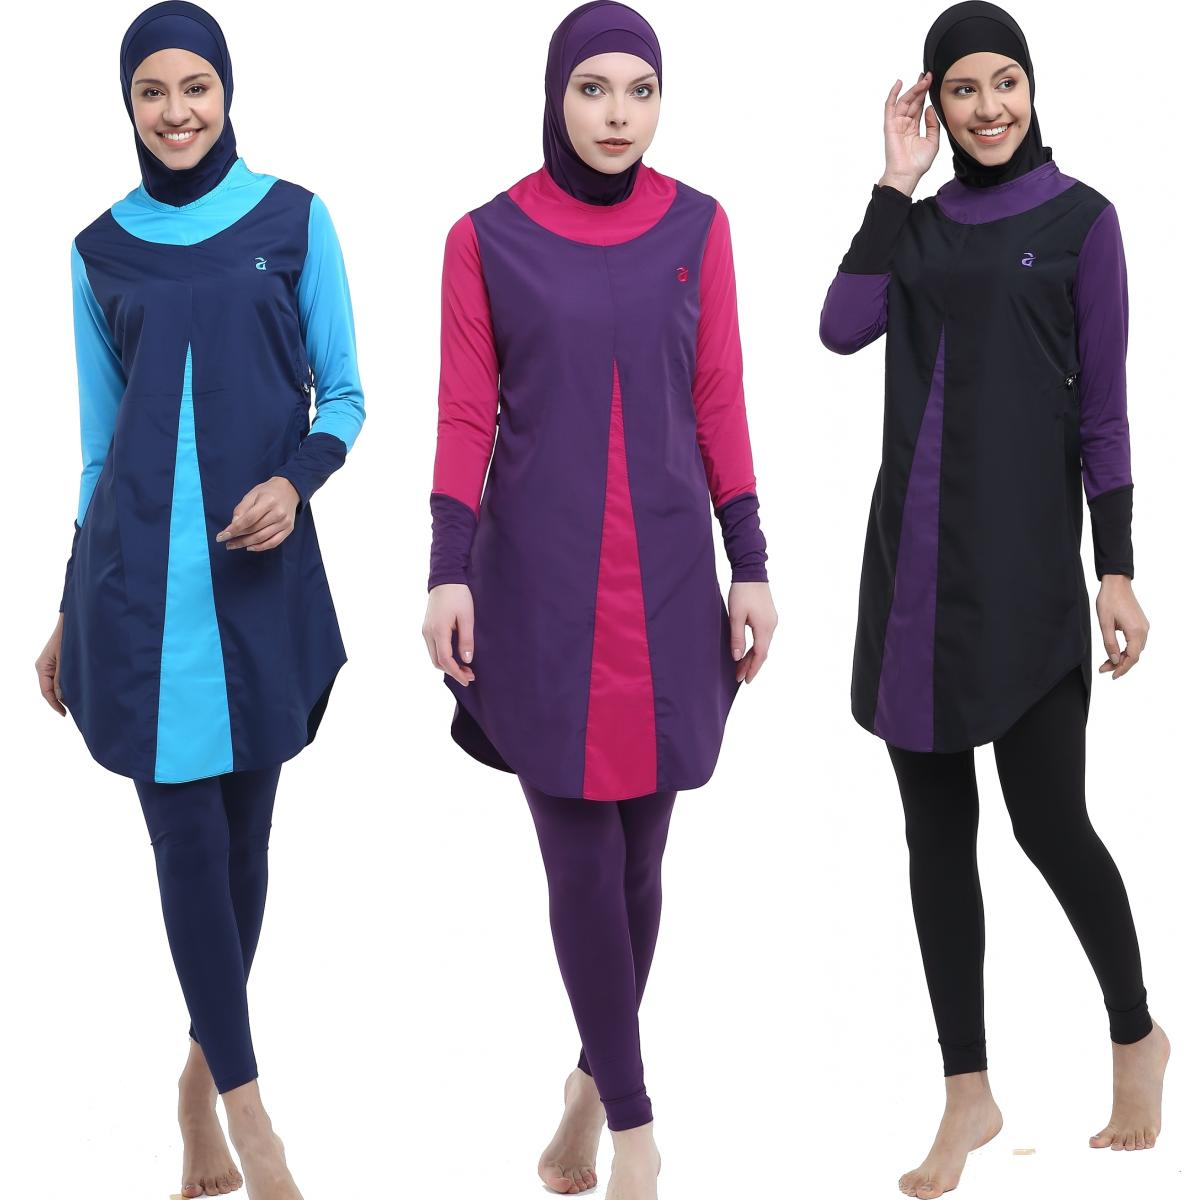 Argisa 7115 Hidden Zipper Micro Sleeves Long Hijab Swimwear S-XXL Muslim Hijab Islamic Swimsuit Swim Burkinis Full Cover